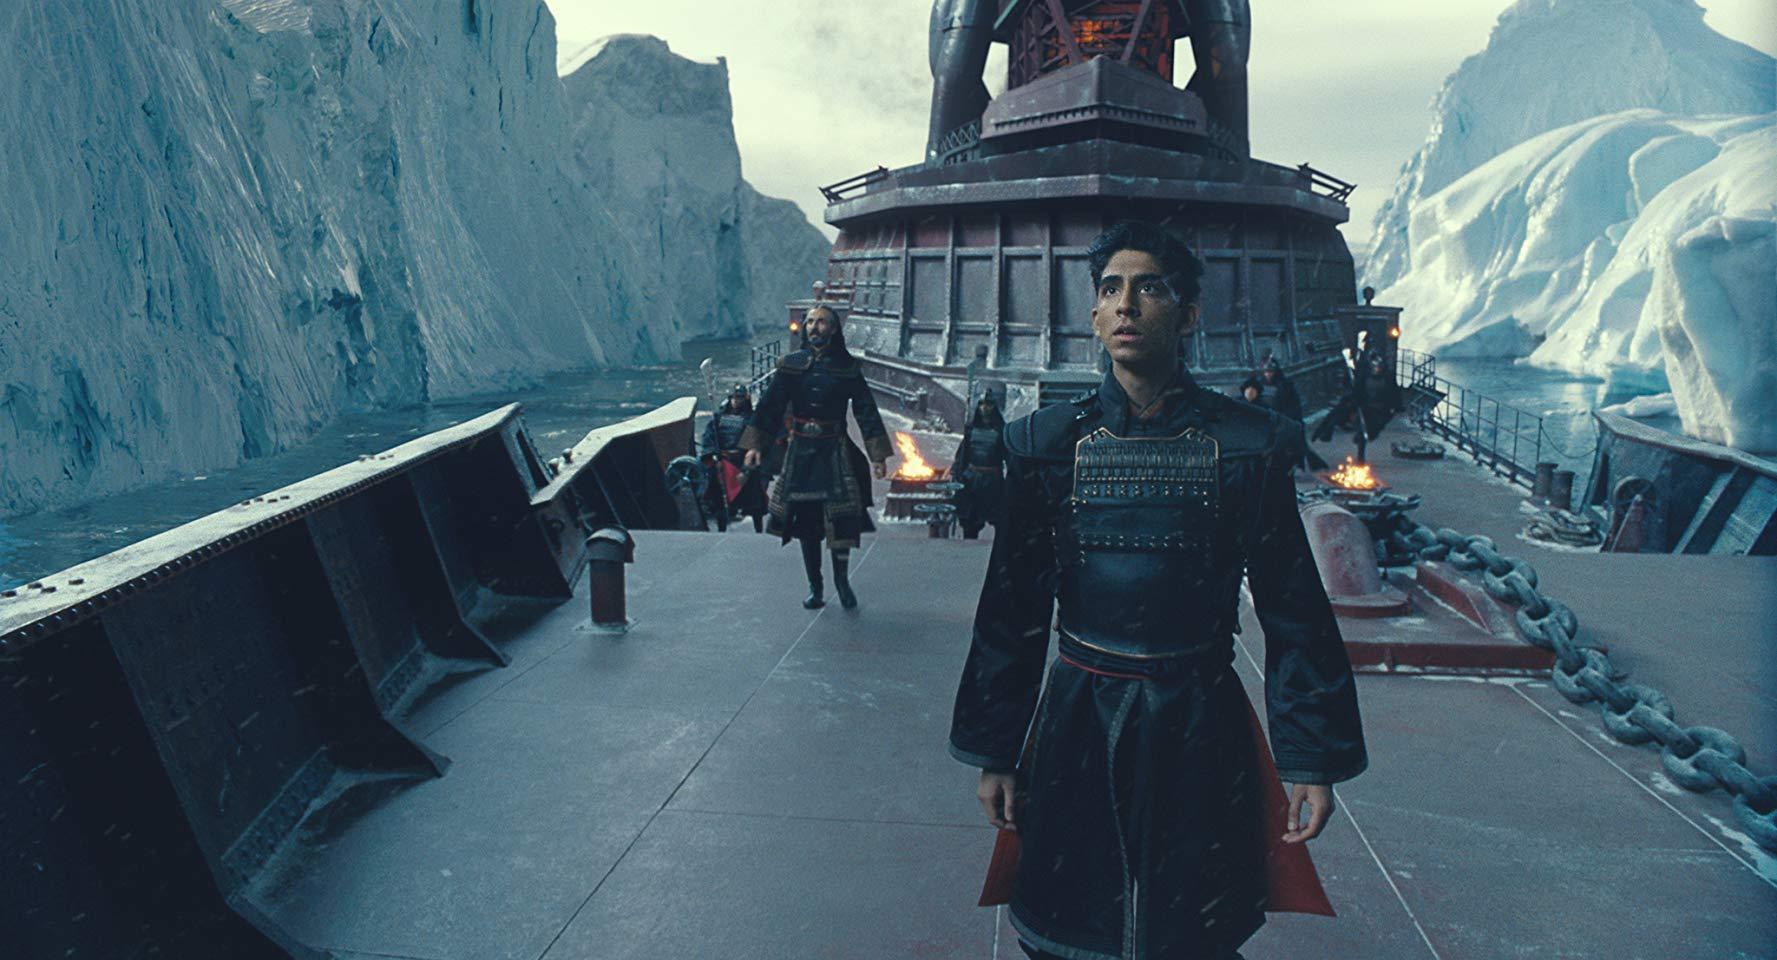 Prince Zuko (Dev Patel) aboard warship in The Last Airbender (2010)